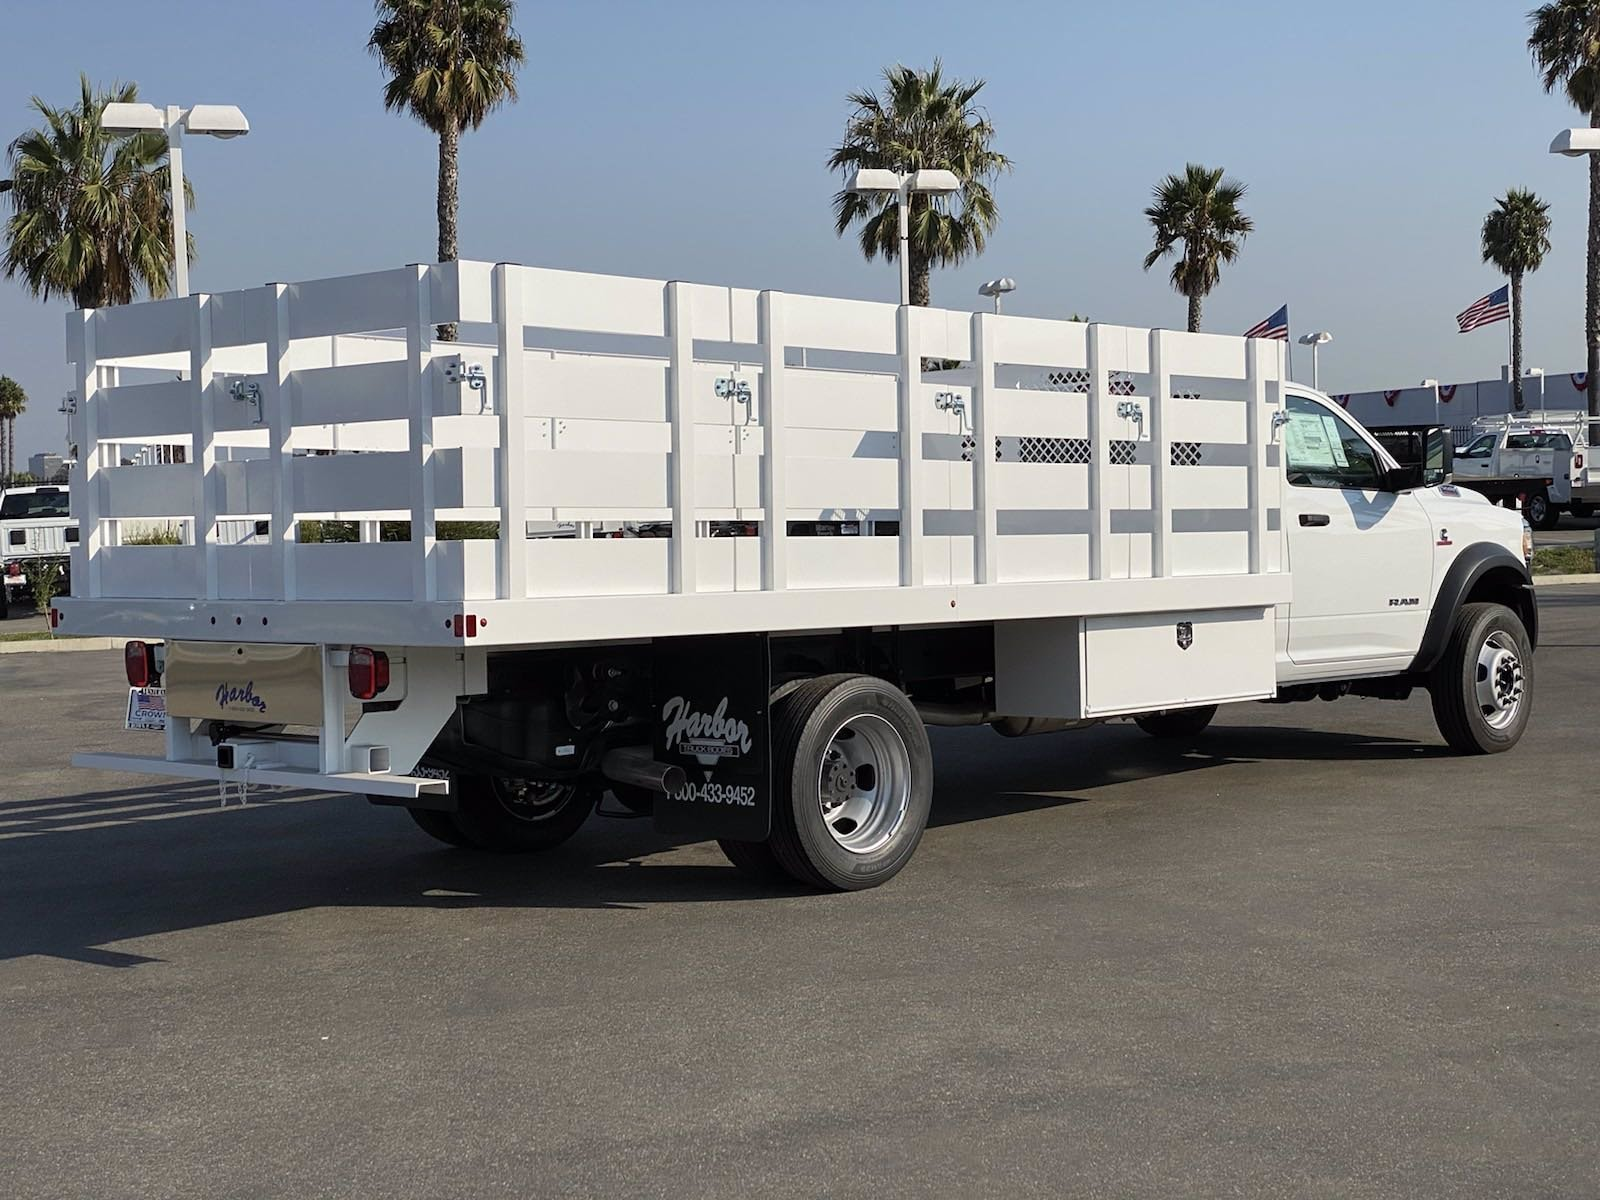 2020 Ram 5500 Regular Cab DRW 4x2, Harbor Platform Body #H2361 - photo 1